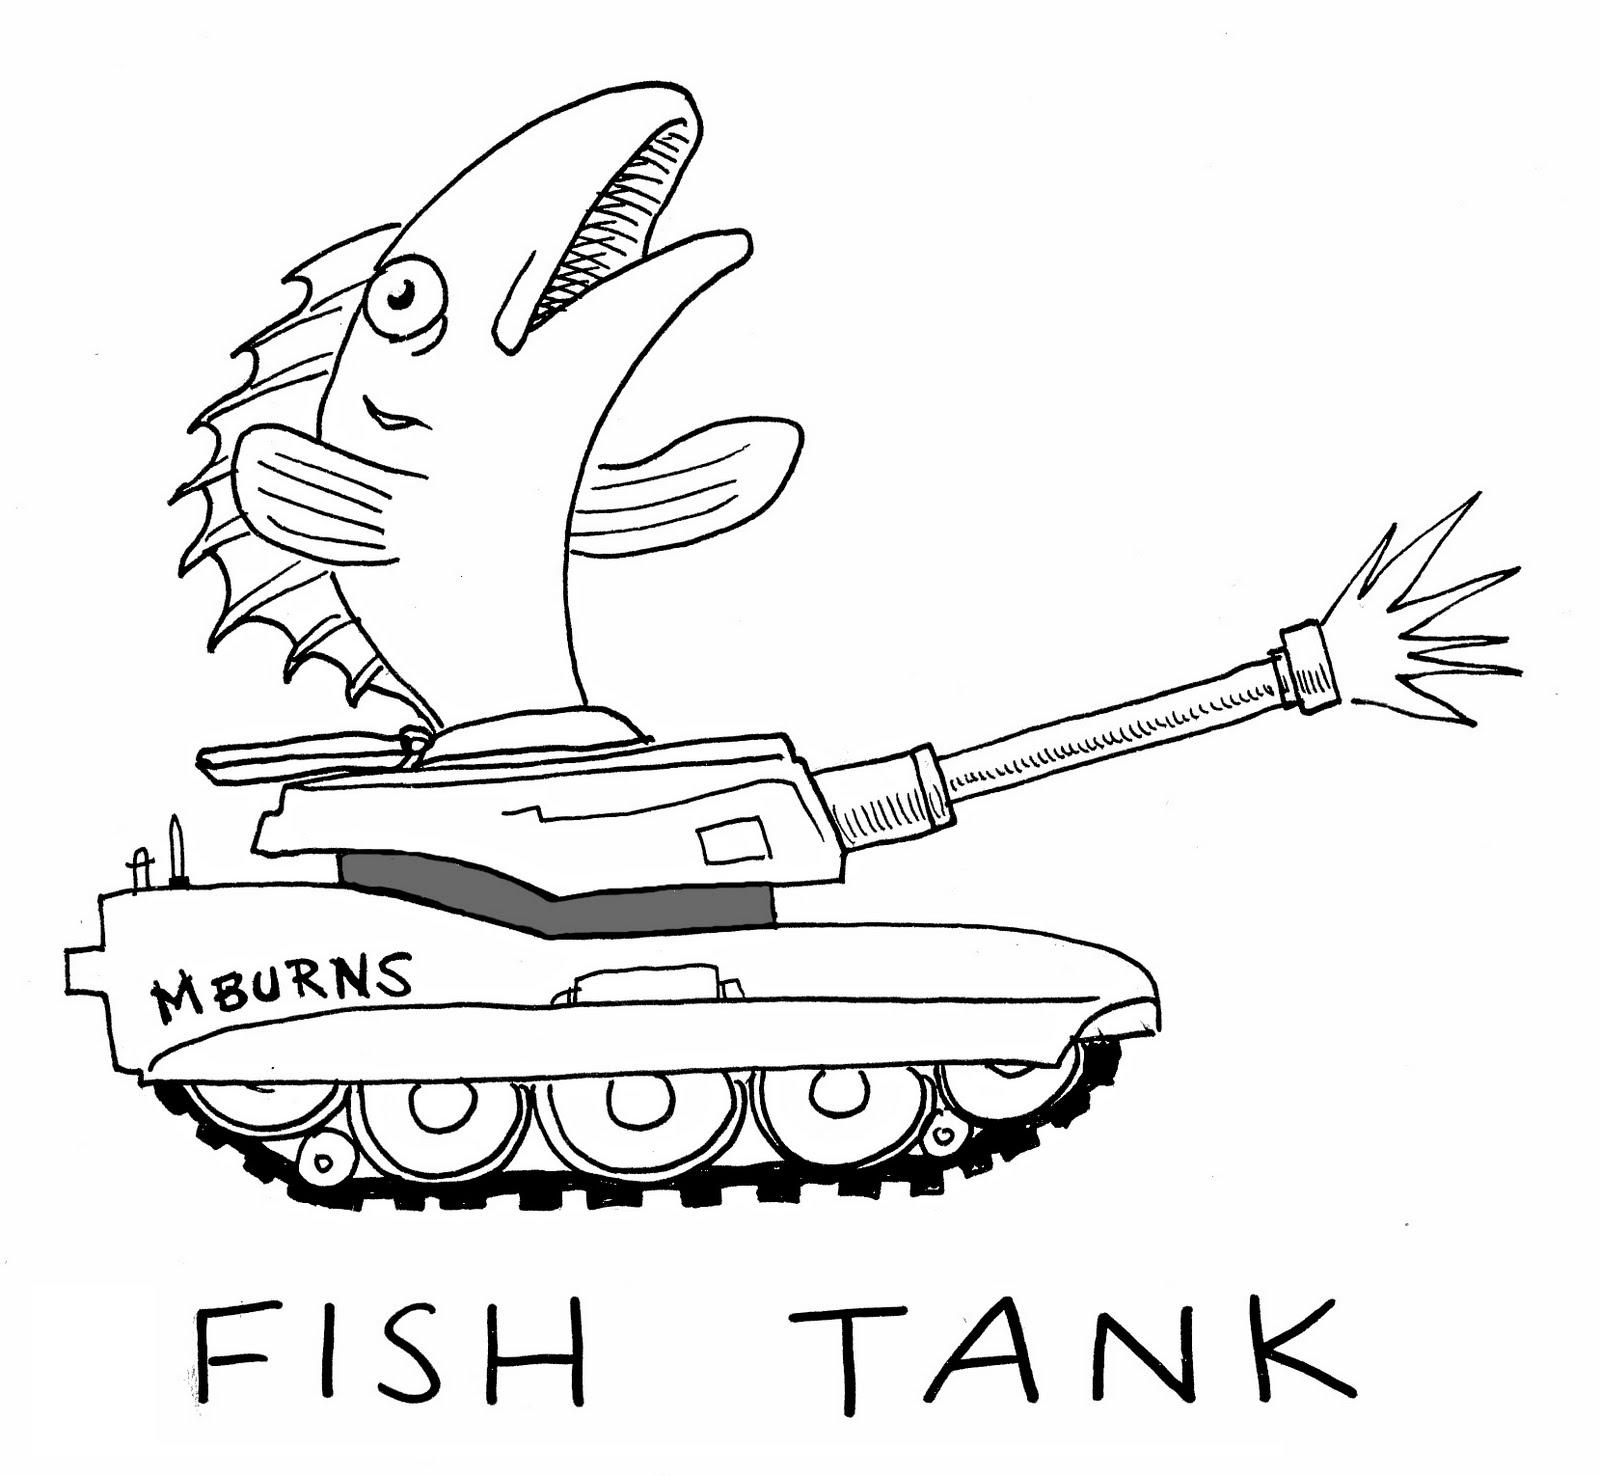 Fish tank drawing pictures - Fish Tank Soul Mates Step Ladder